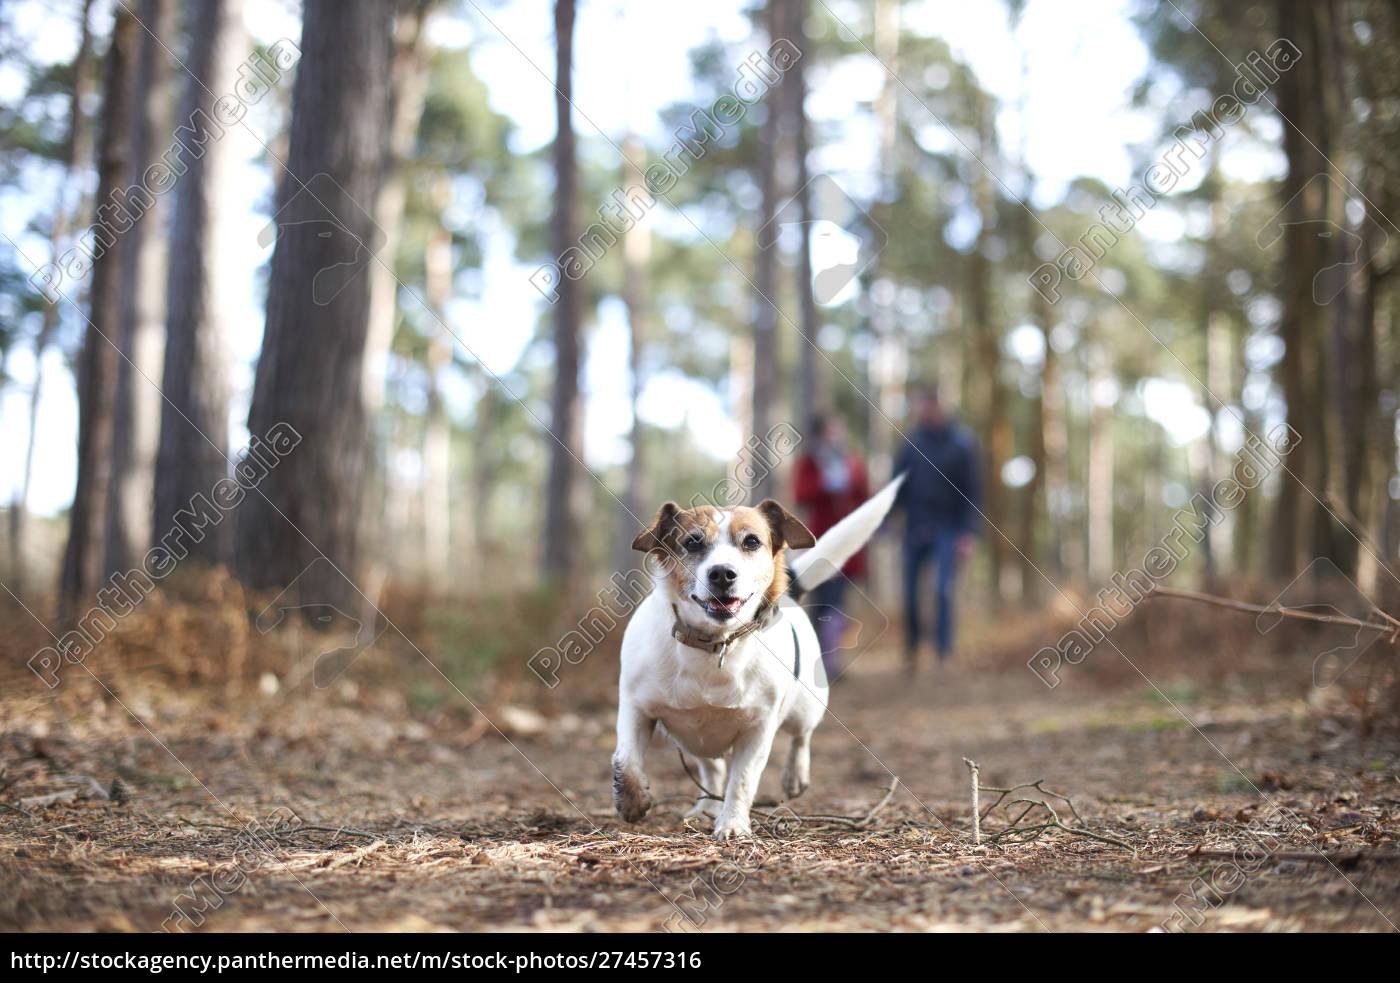 happy, , carefree, dog, running, in, autumn - 27457316